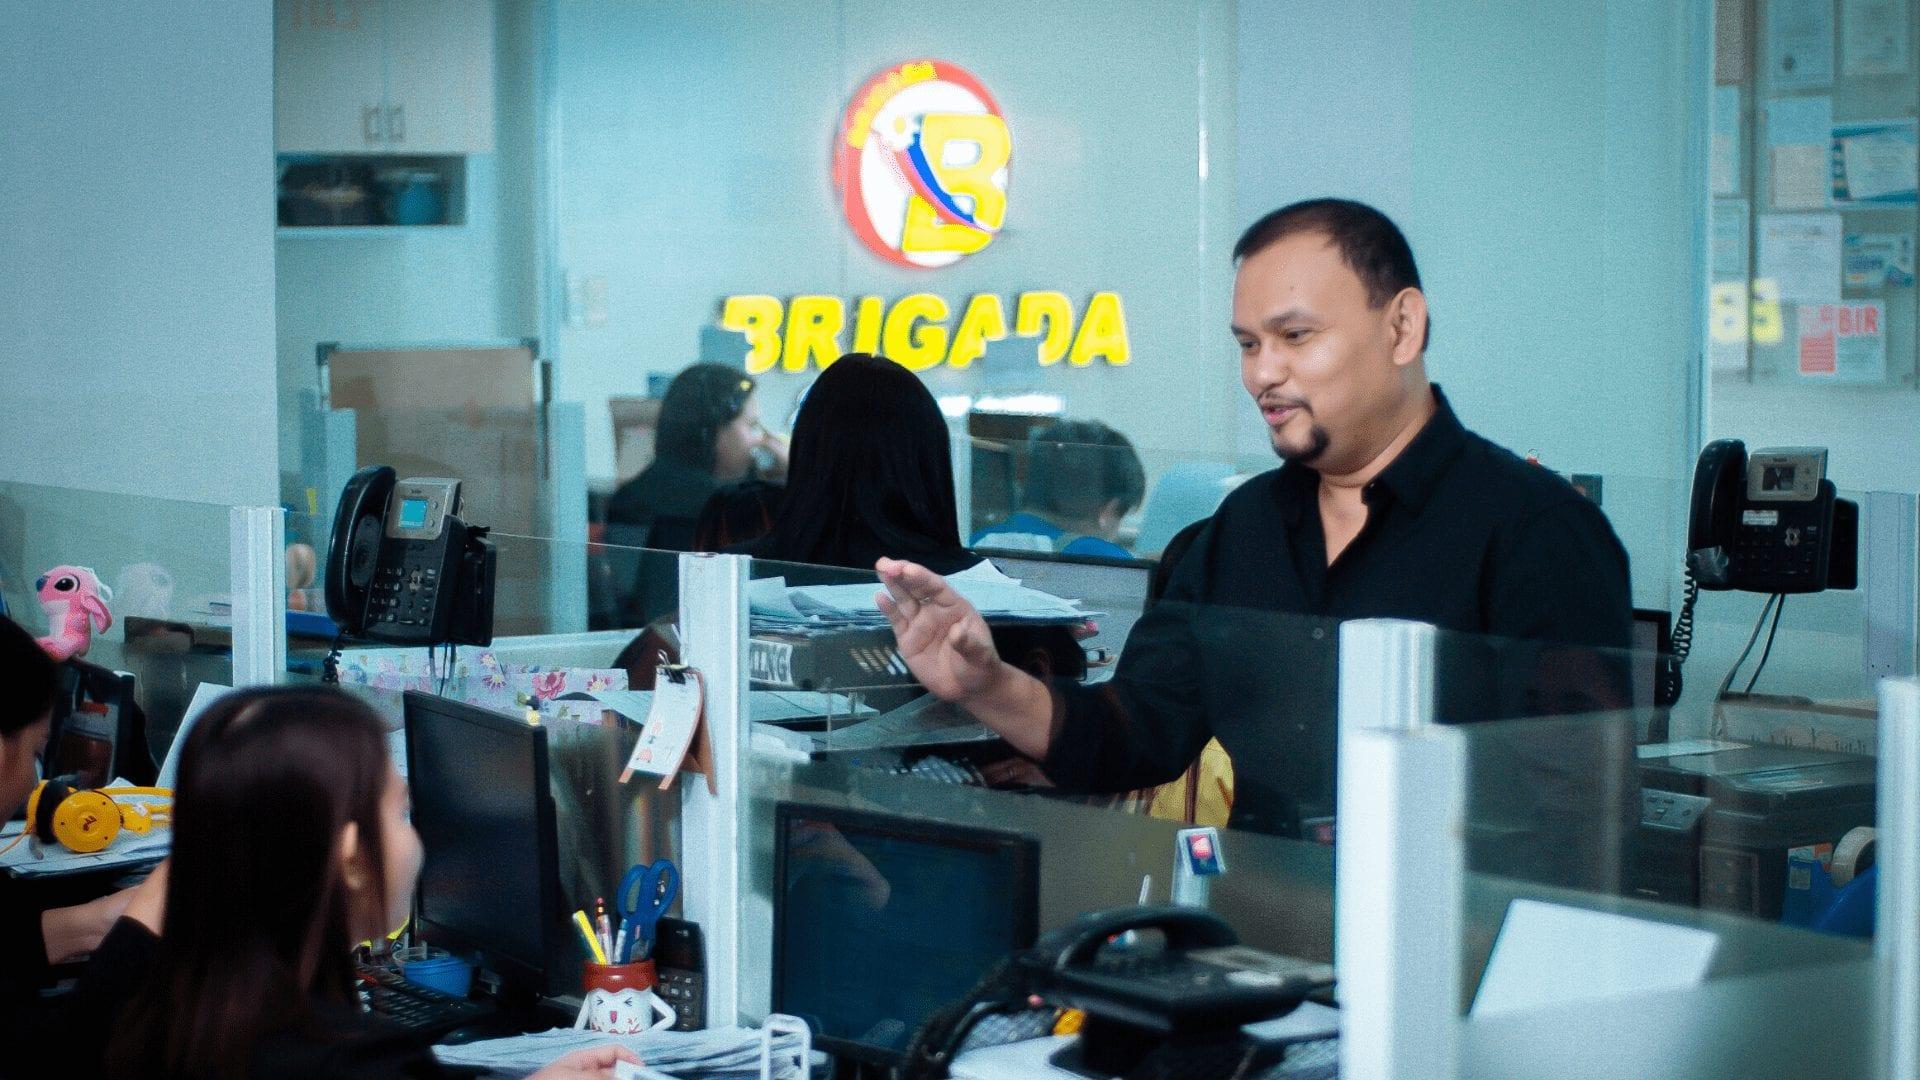 Brigada Group of Companies, Inc.